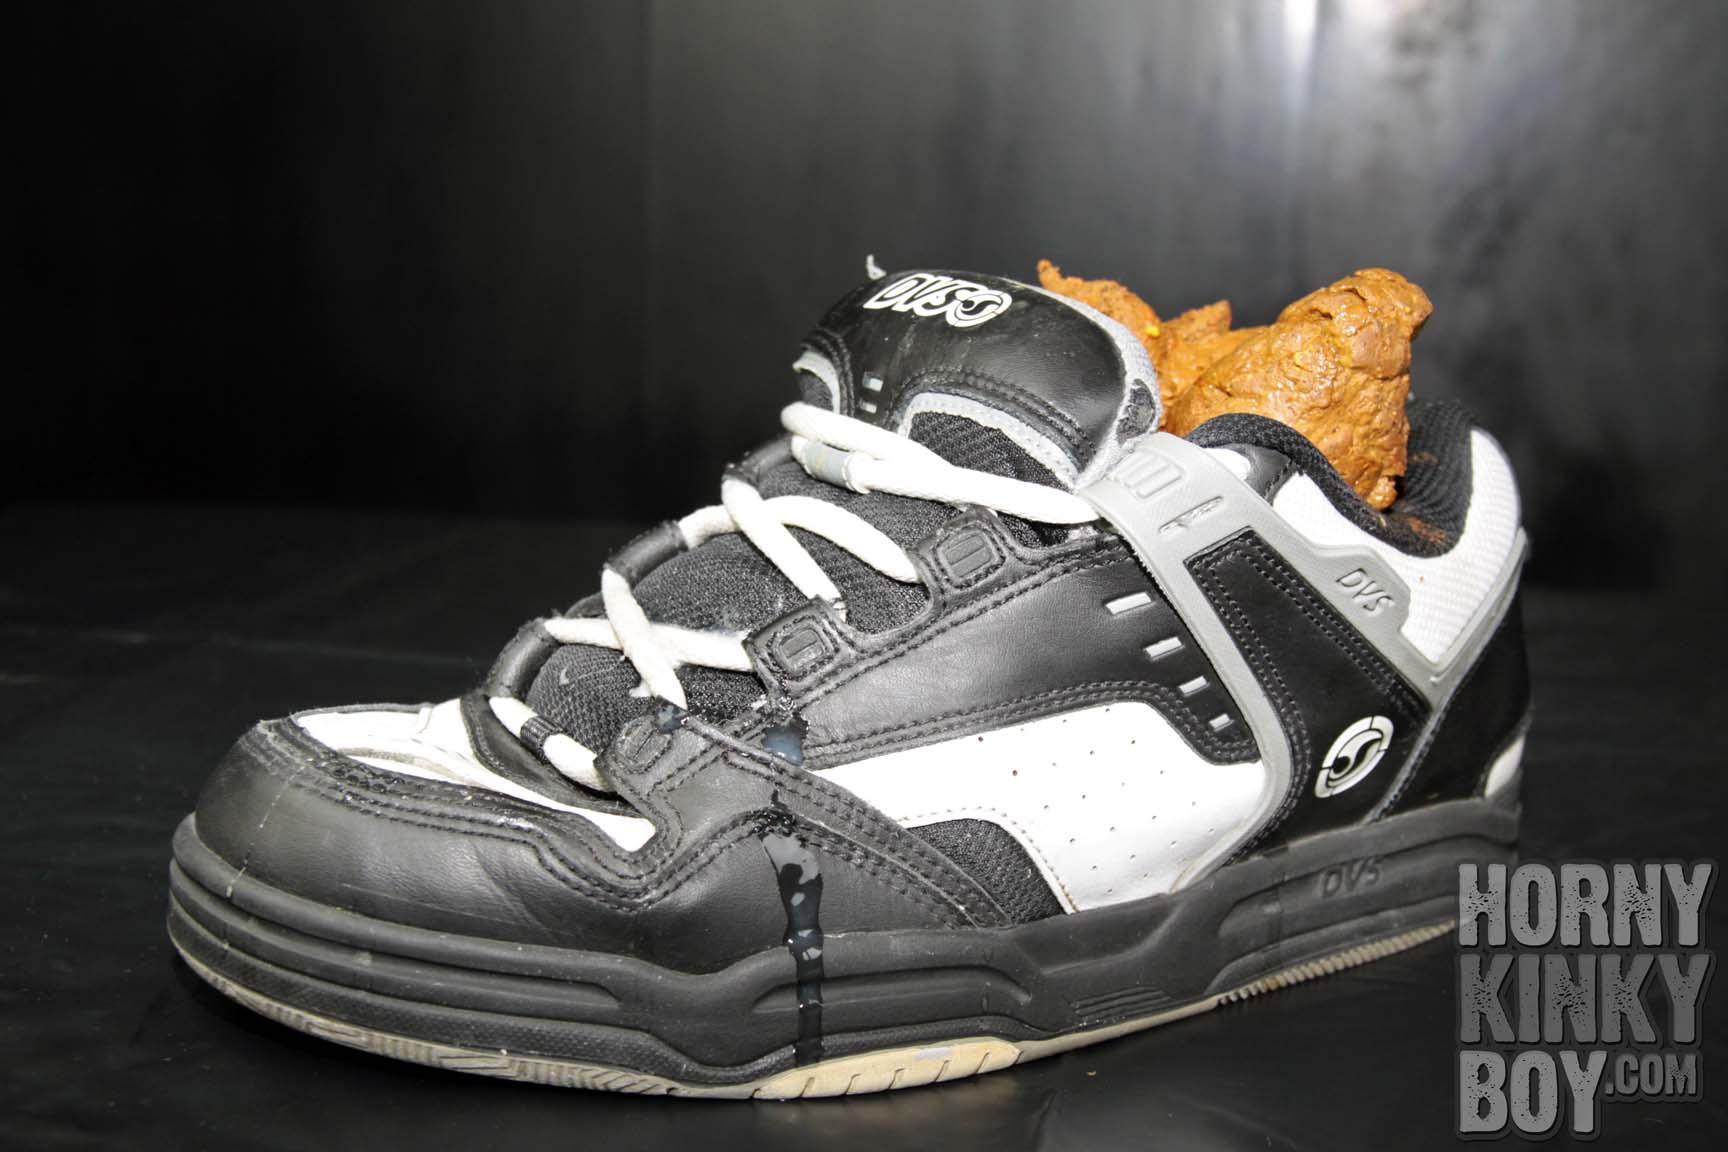 HornyKinkyBoy's Shit Sneakers I